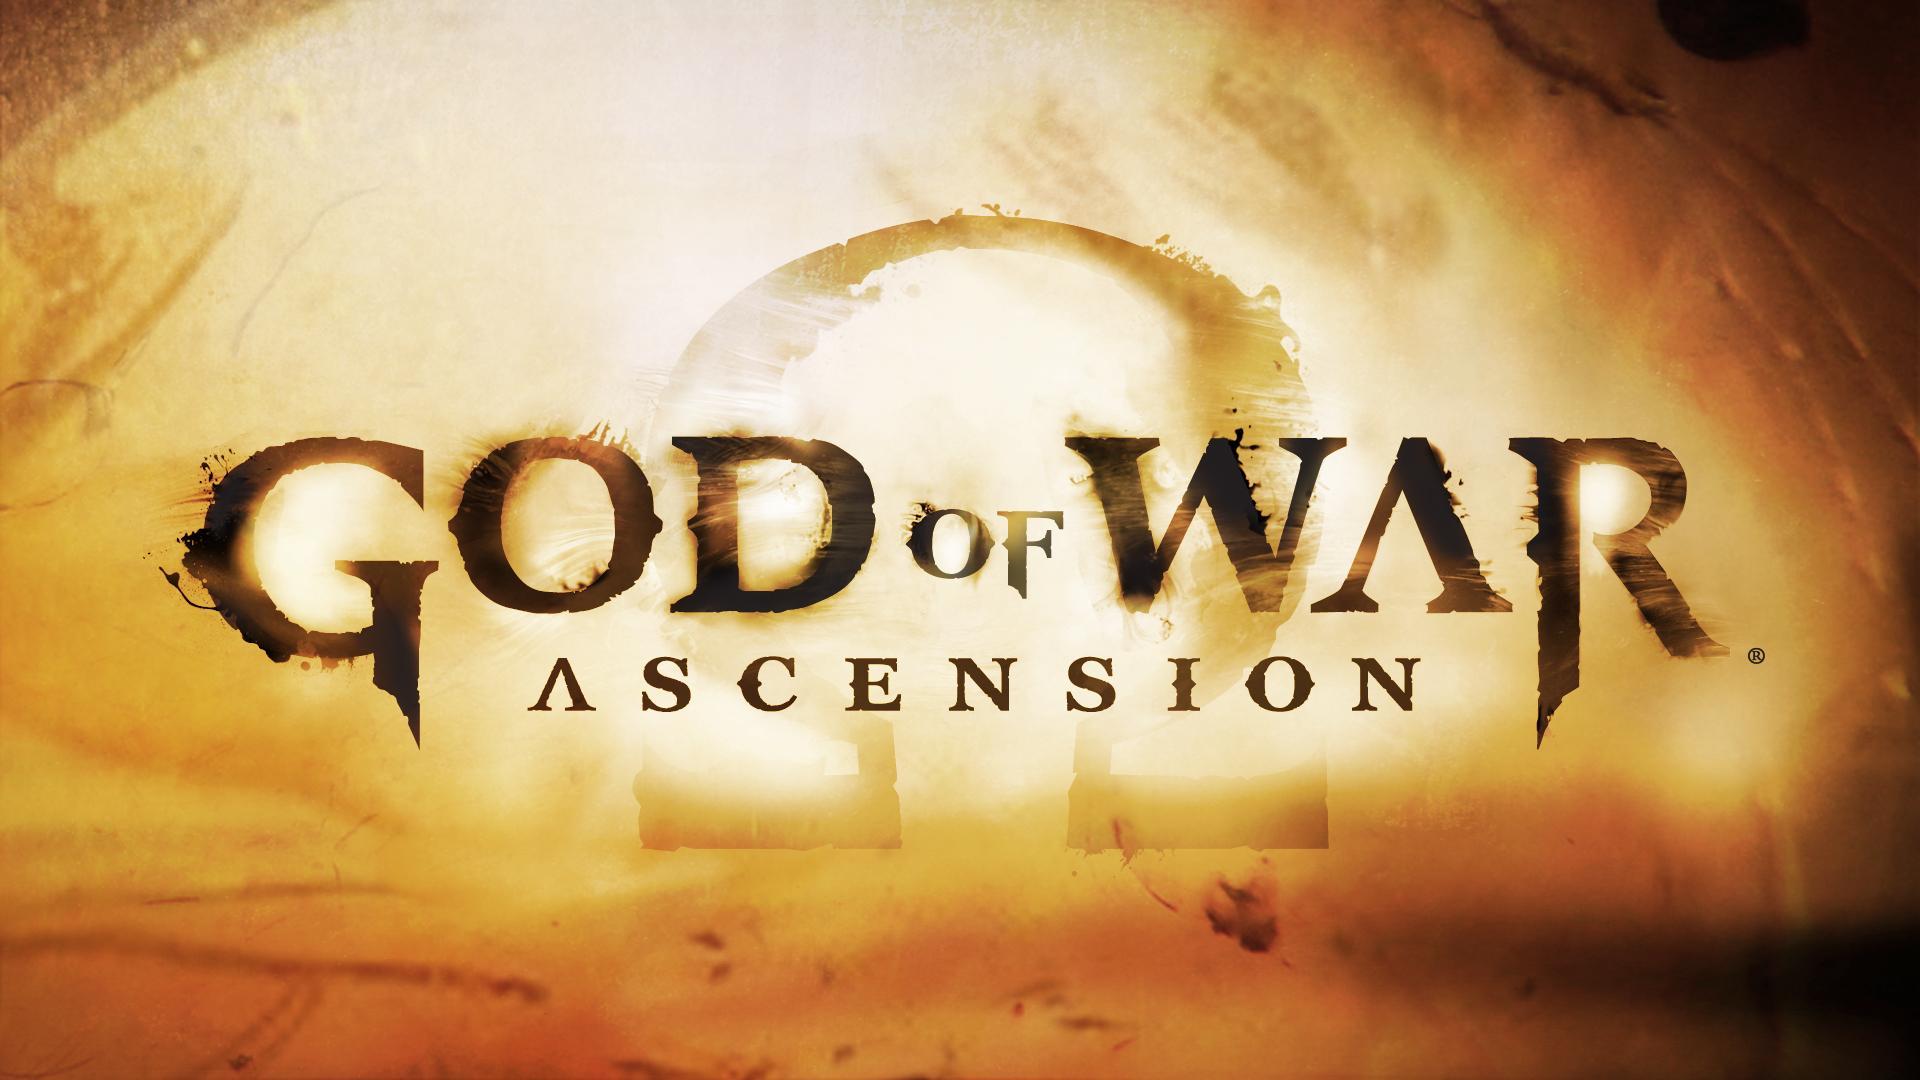 PS3『ゴッド・オブ・ウォー アセンション』、マルチプレイをプレイ